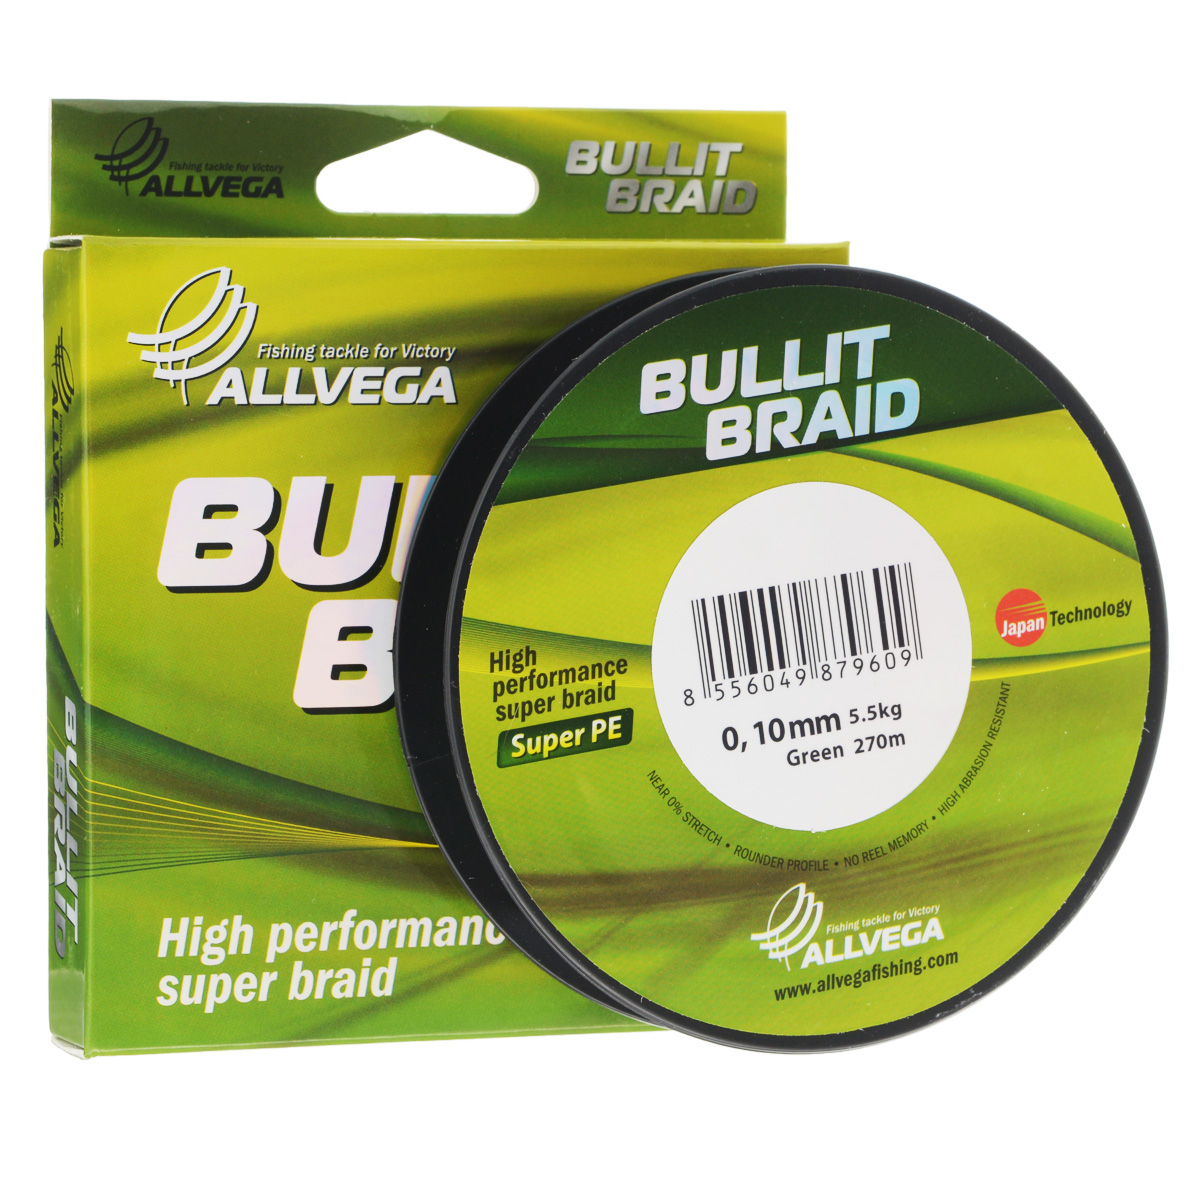 Леска плетеная Allvega Bullit Braid, цвет: темно-зеленый, 270 м, 0,10 мм, 5,5 кг